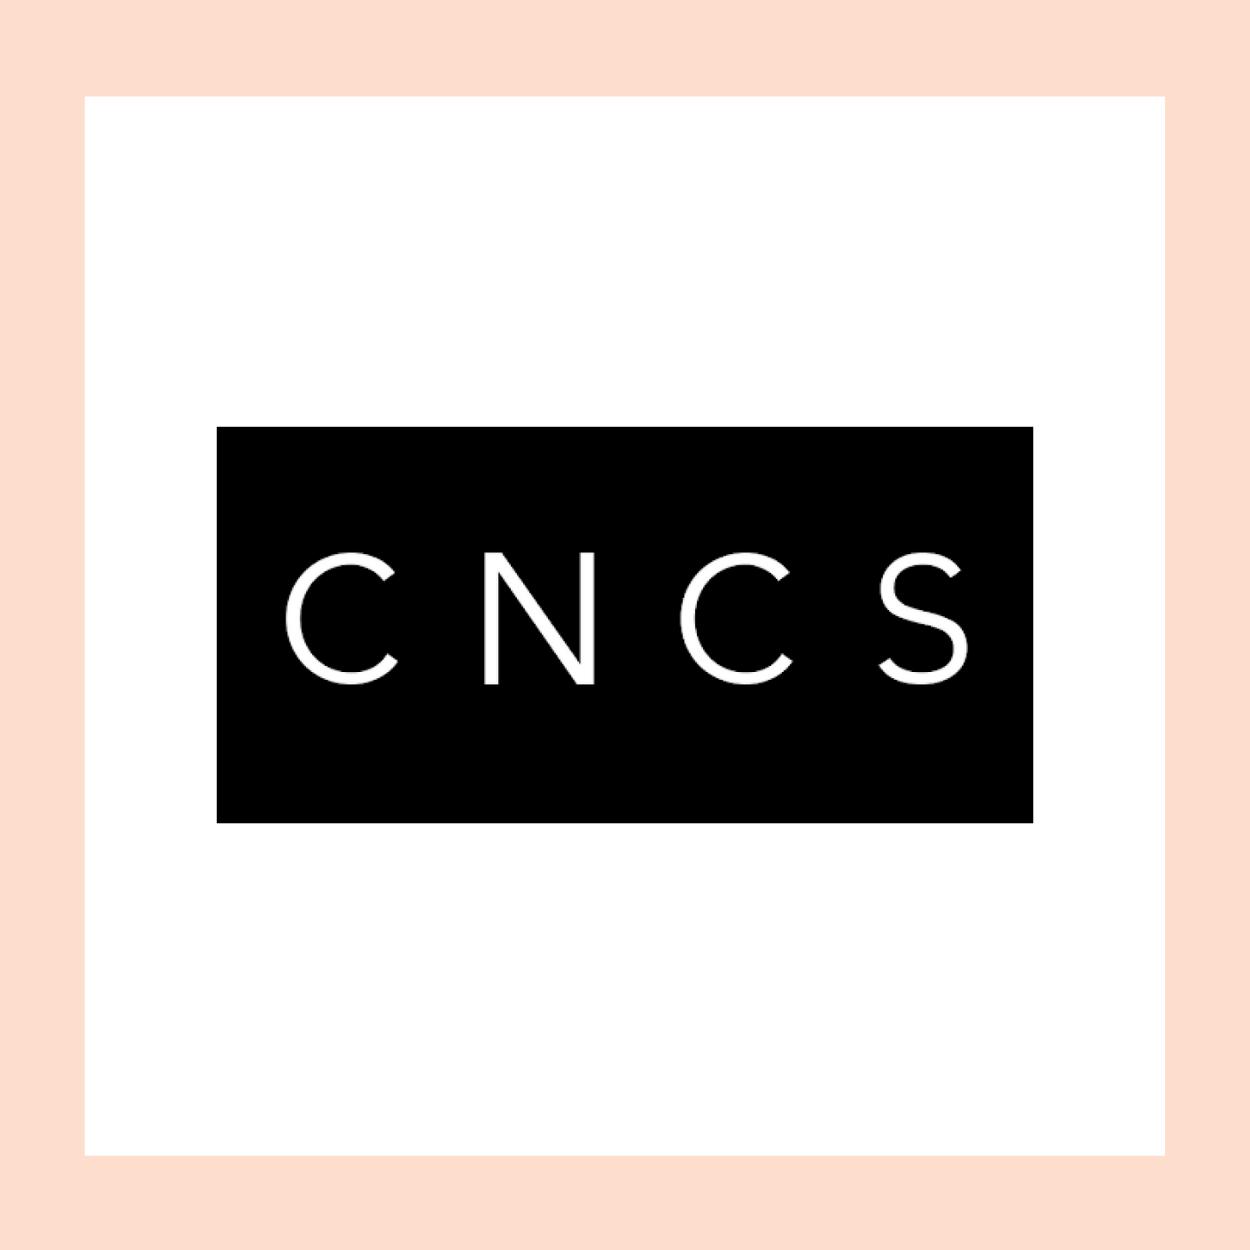 Condé Nast Studio CNCS